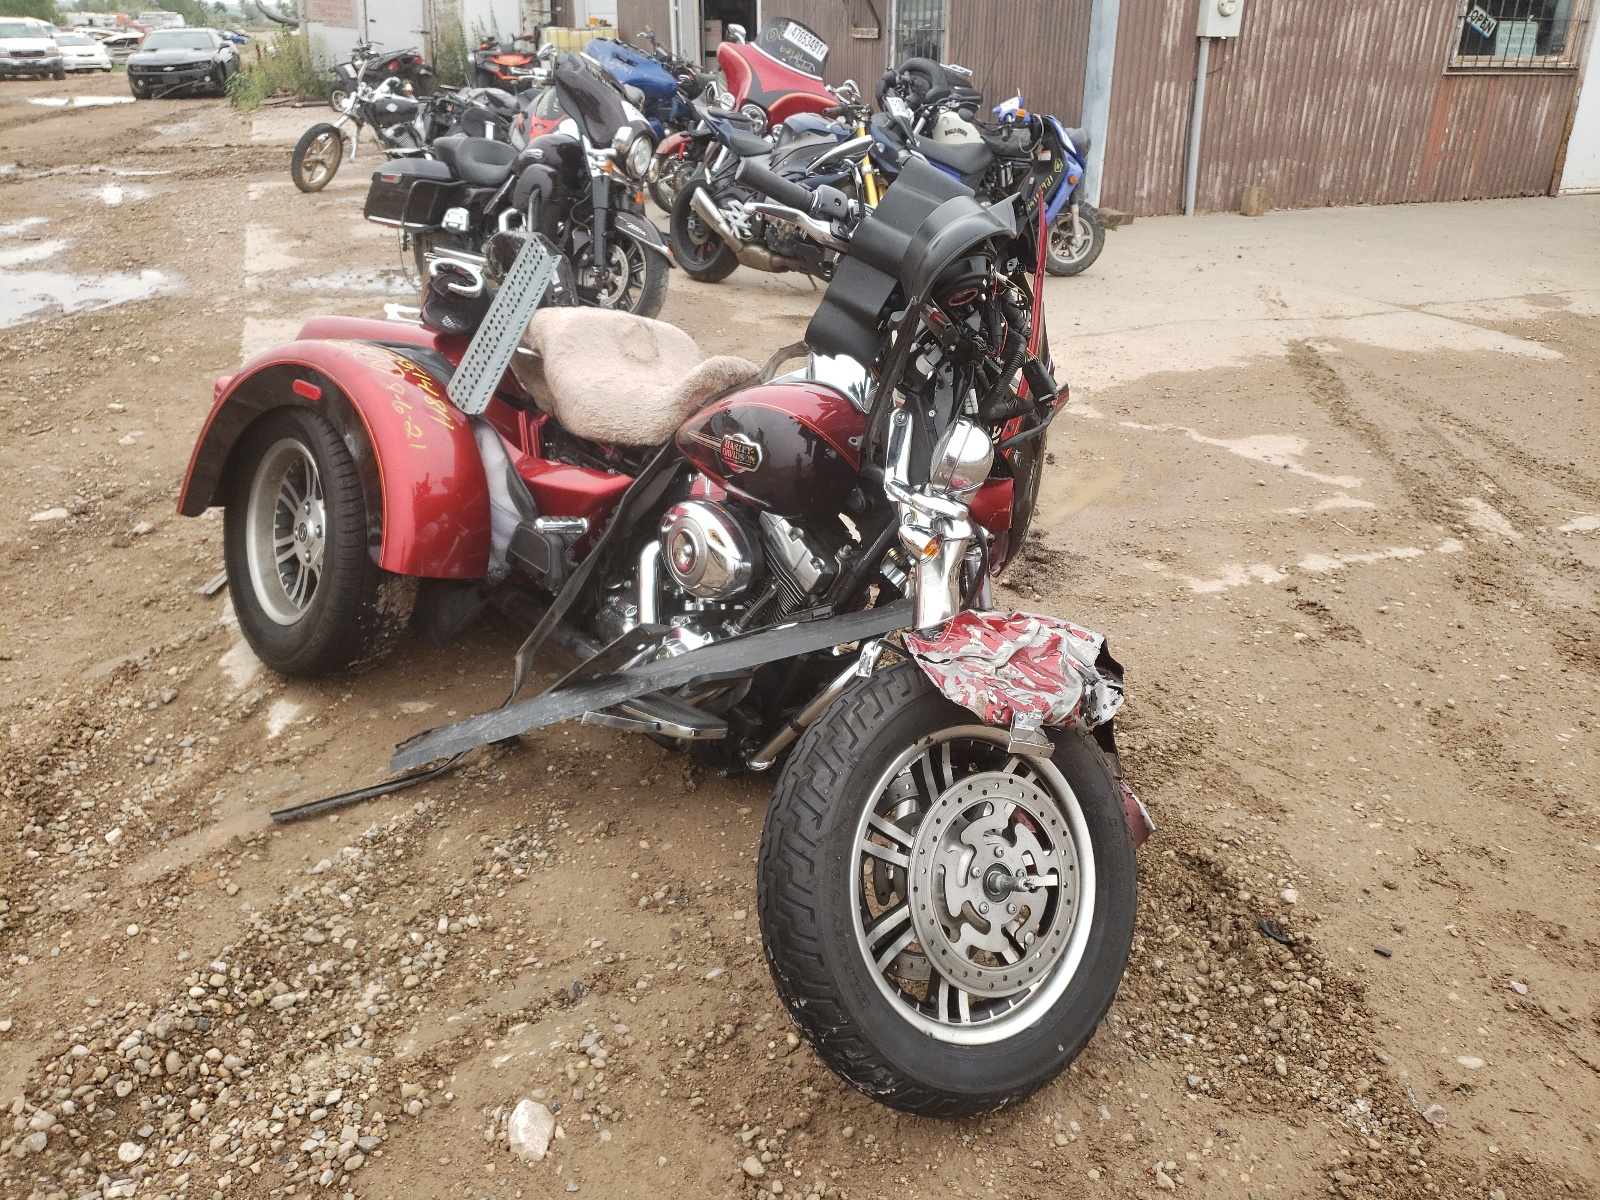 2012 Harley-Davidson Flhtcutg T